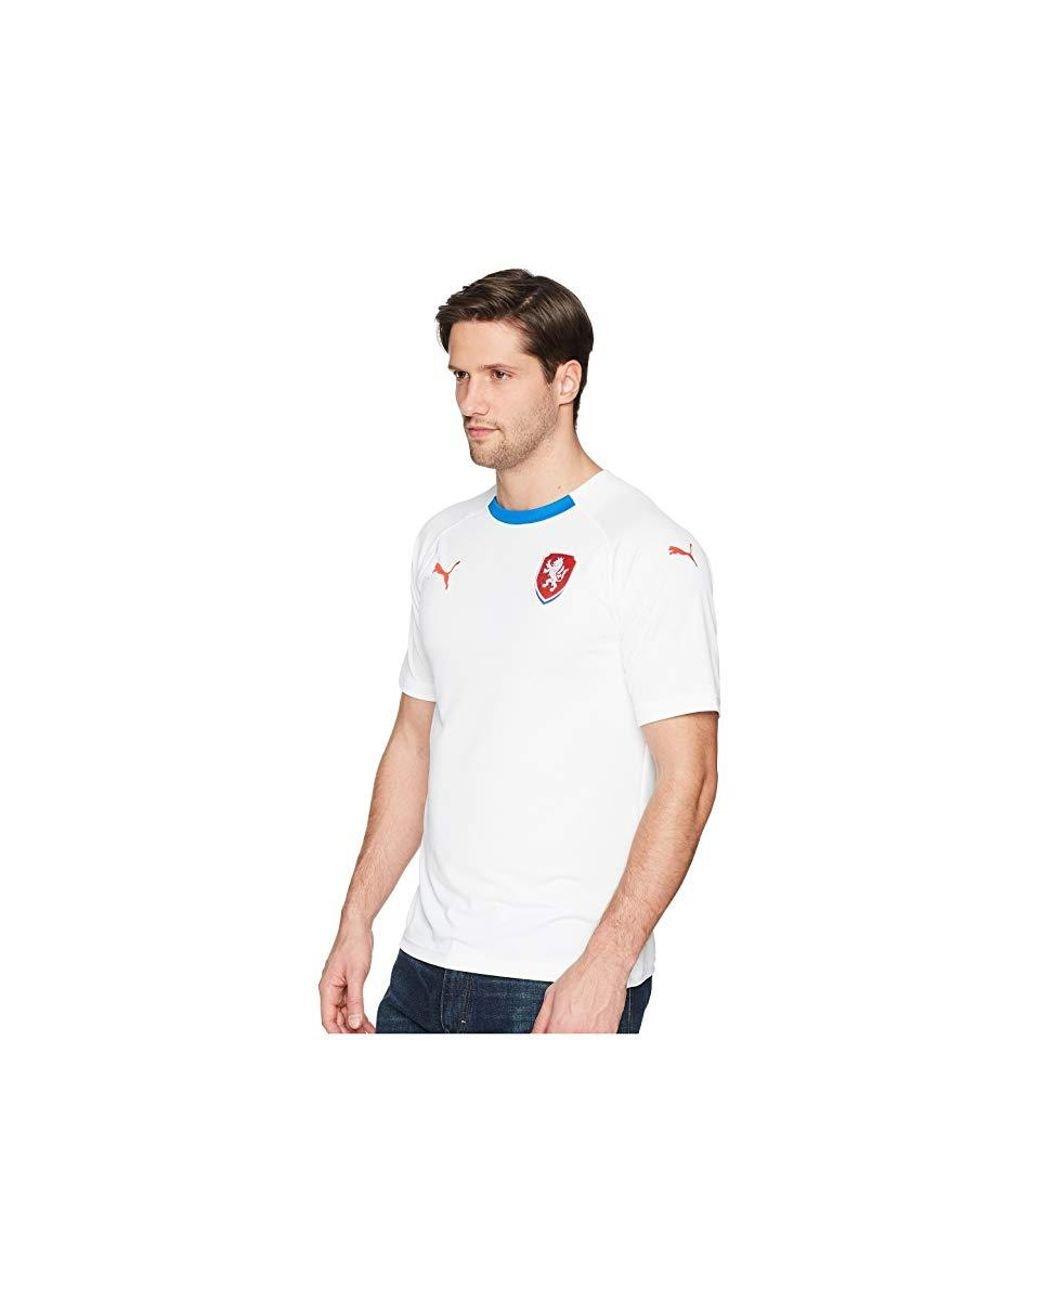 e846f55a35d PUMA Czech Republic Away Replica Shirt ( White/ Royal) Clothing in White  for Men - Save 9% - Lyst